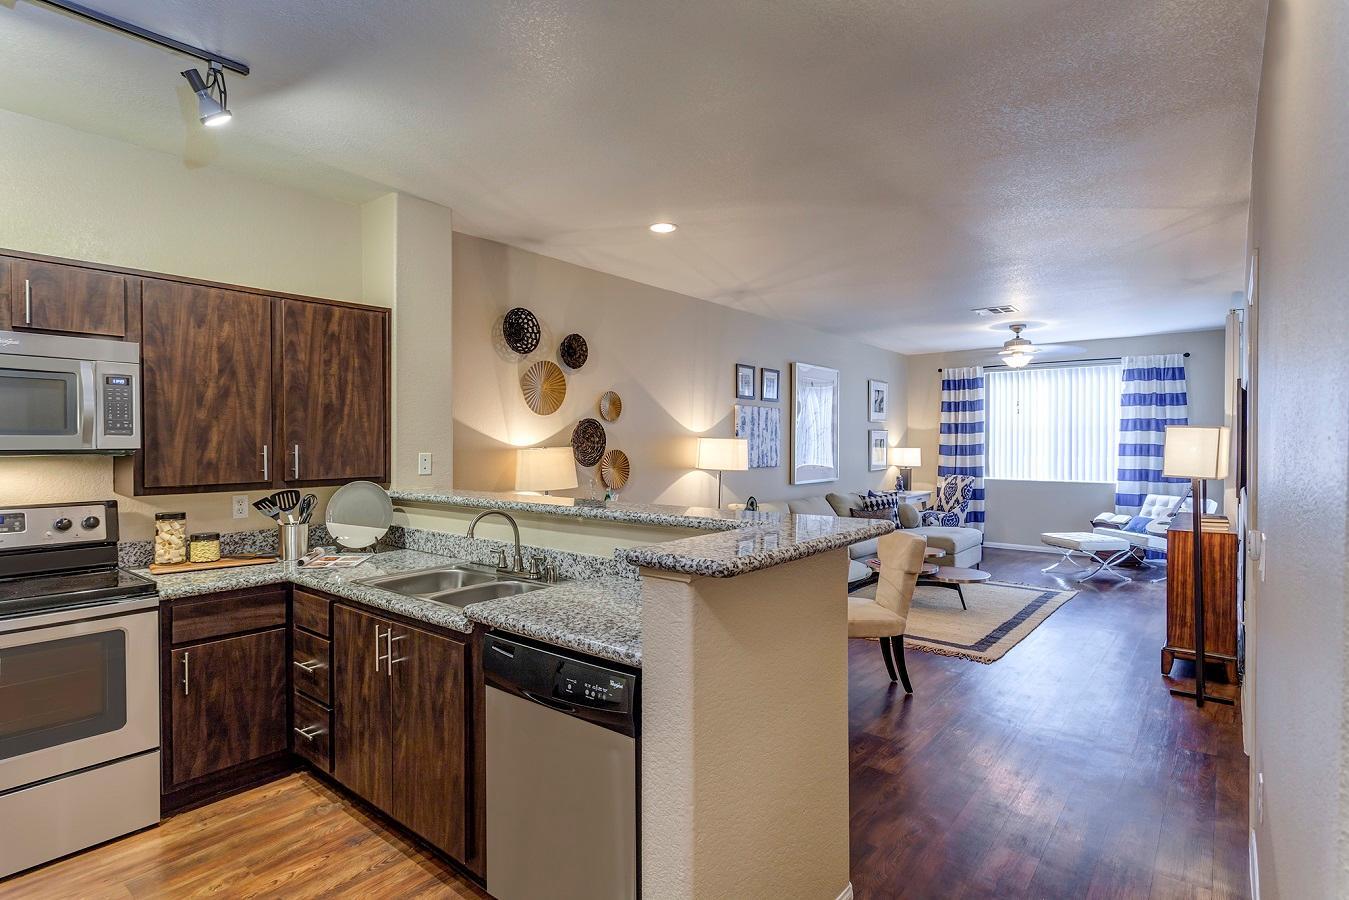 Camden Crown Valley Apartments image 1